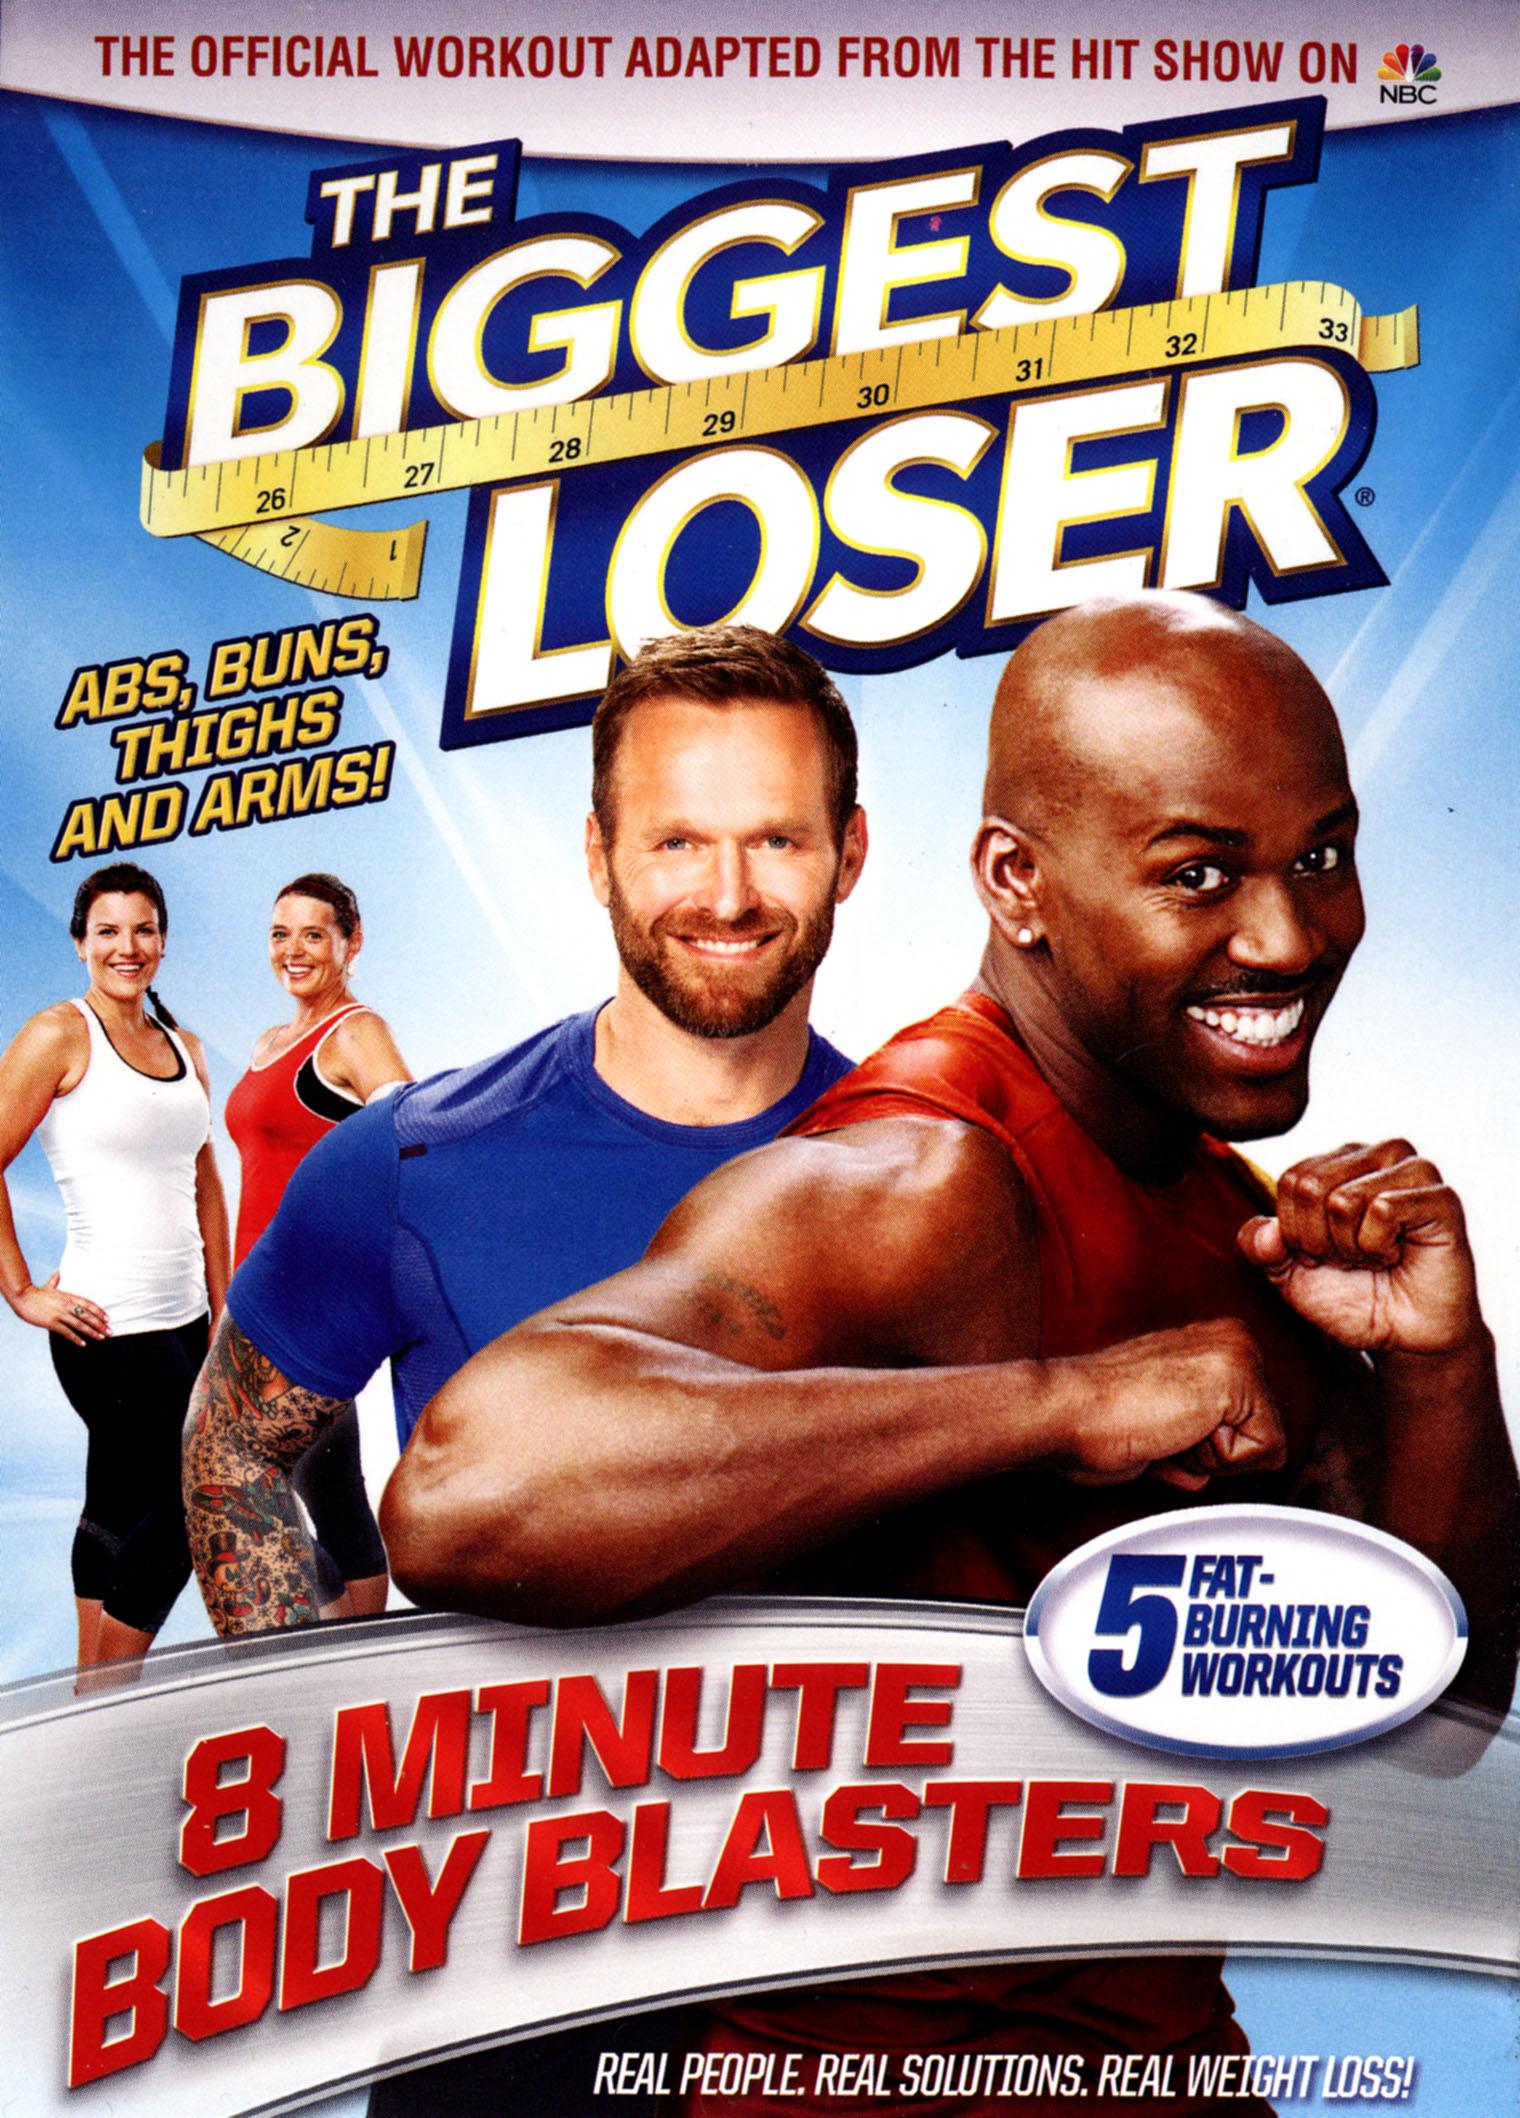 The Biggest Loser: 8 Minute Body Blasters